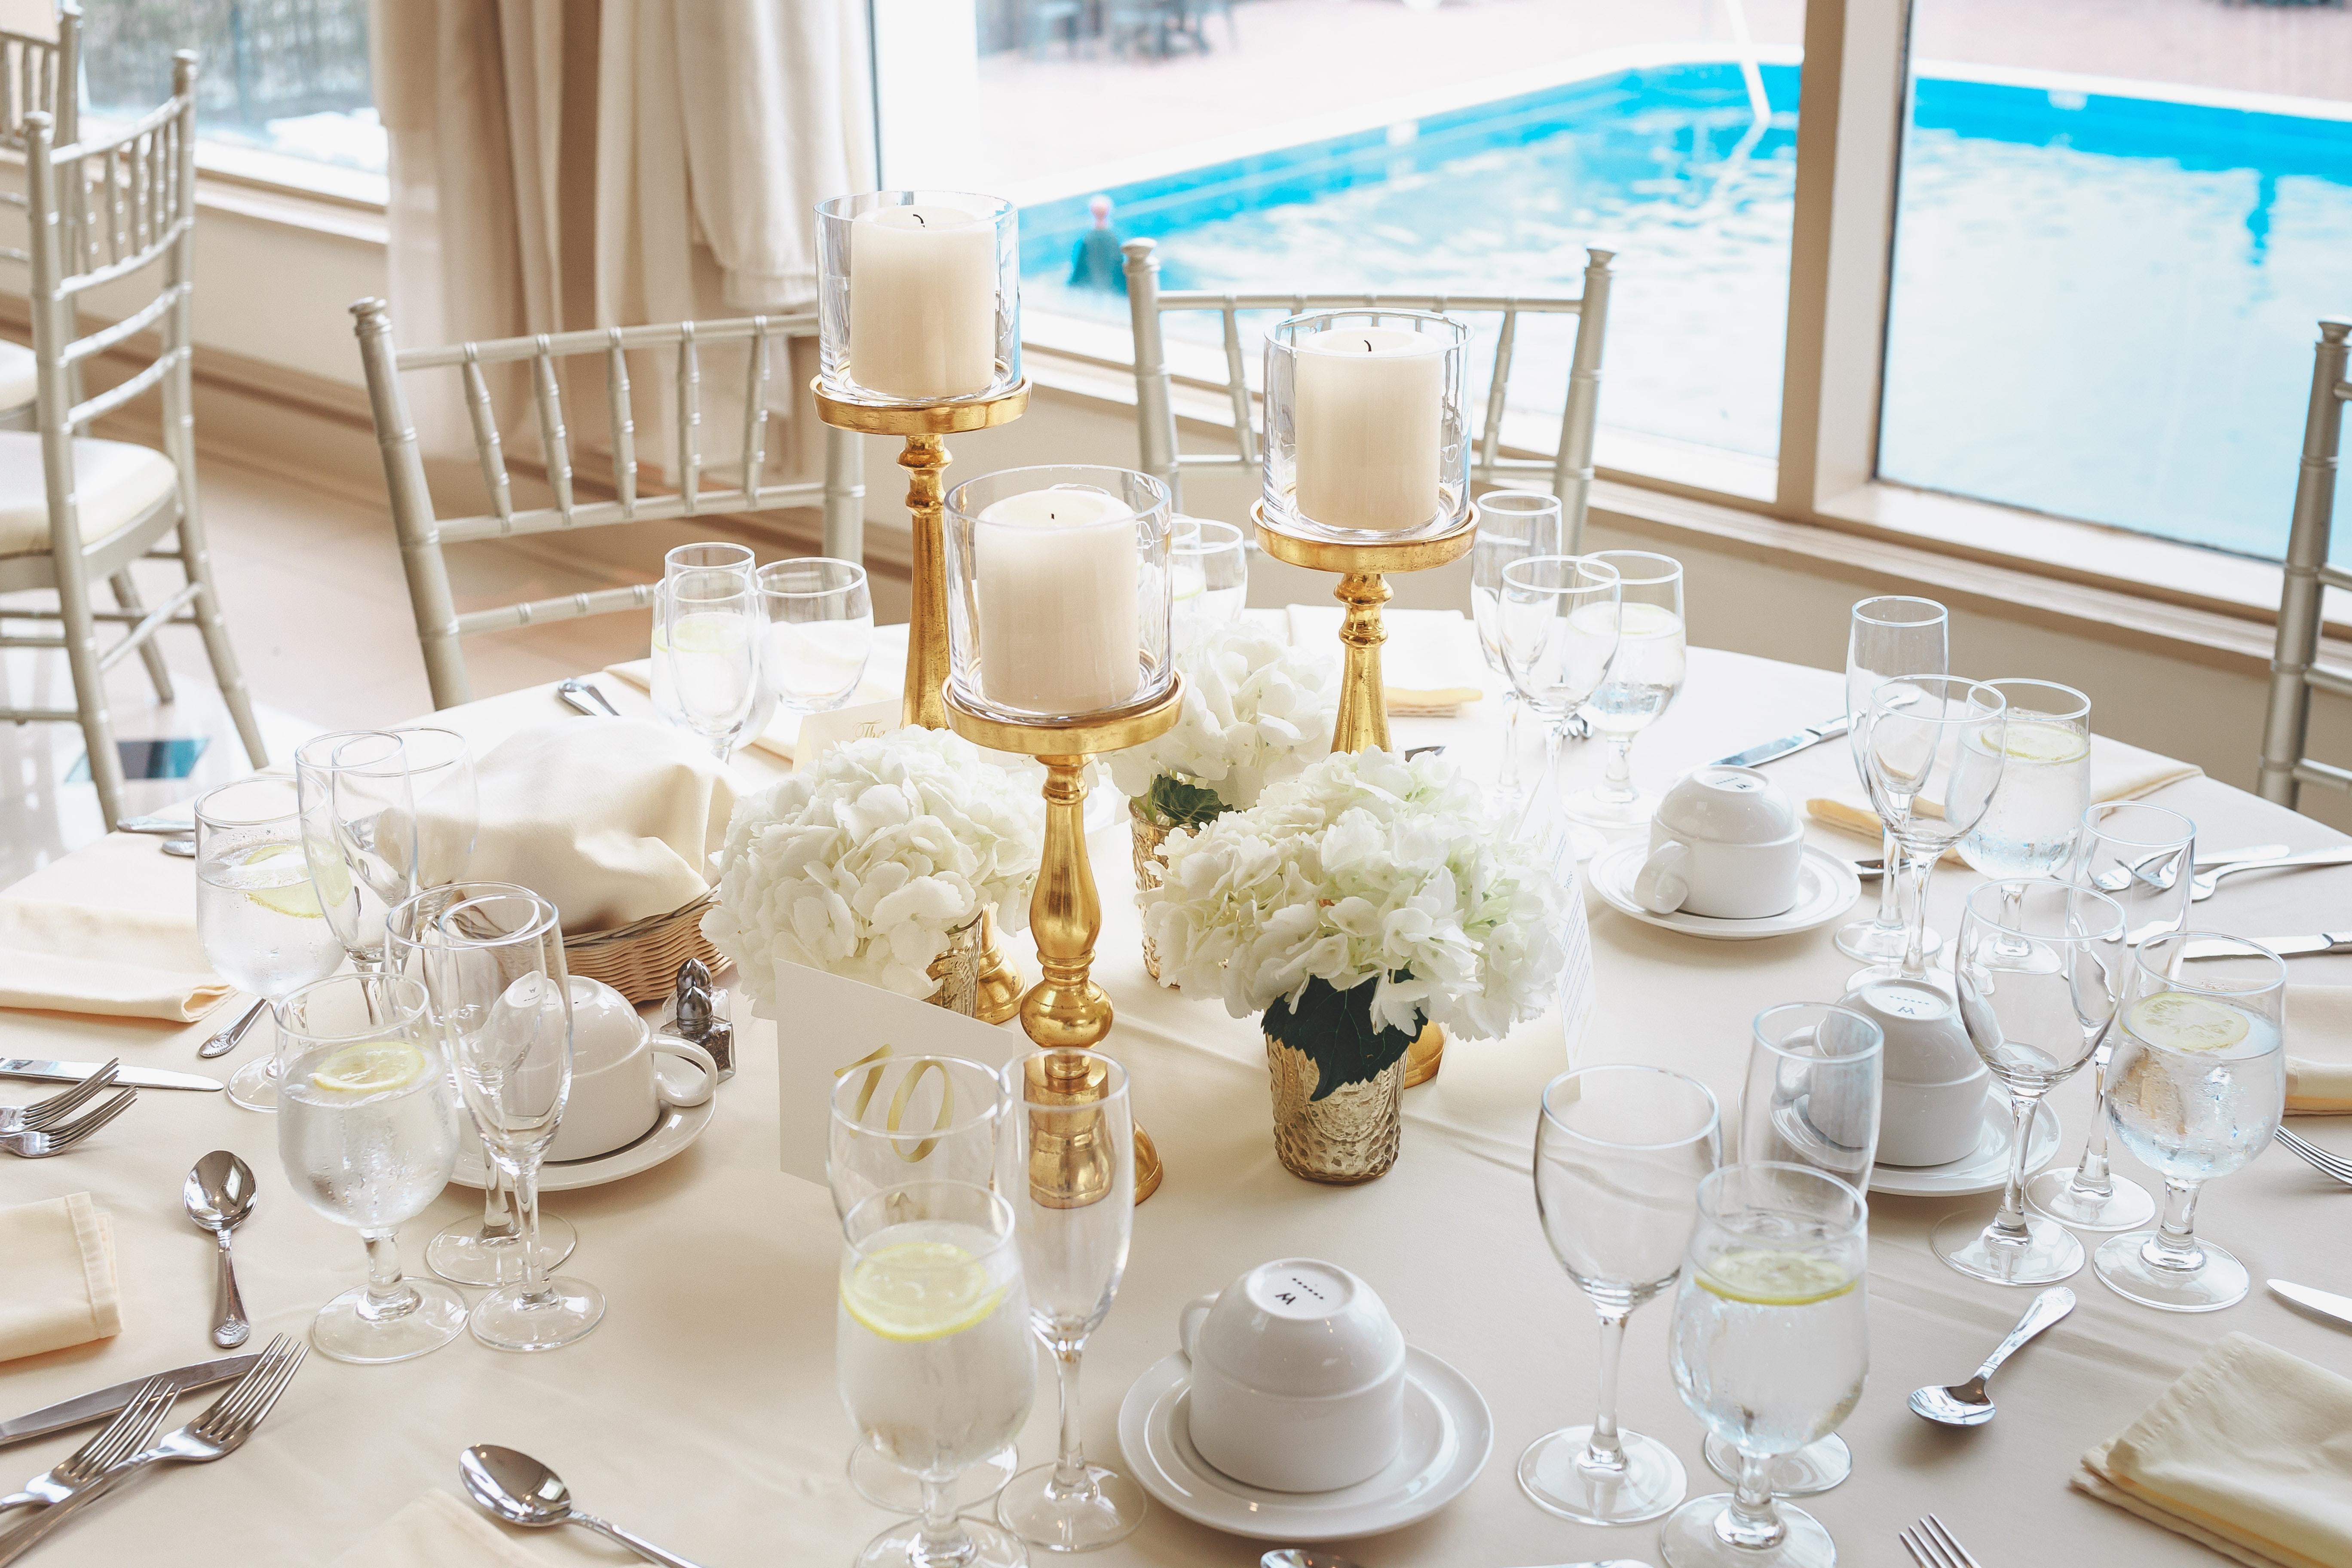 elegant-table-setting-2306278.jpg